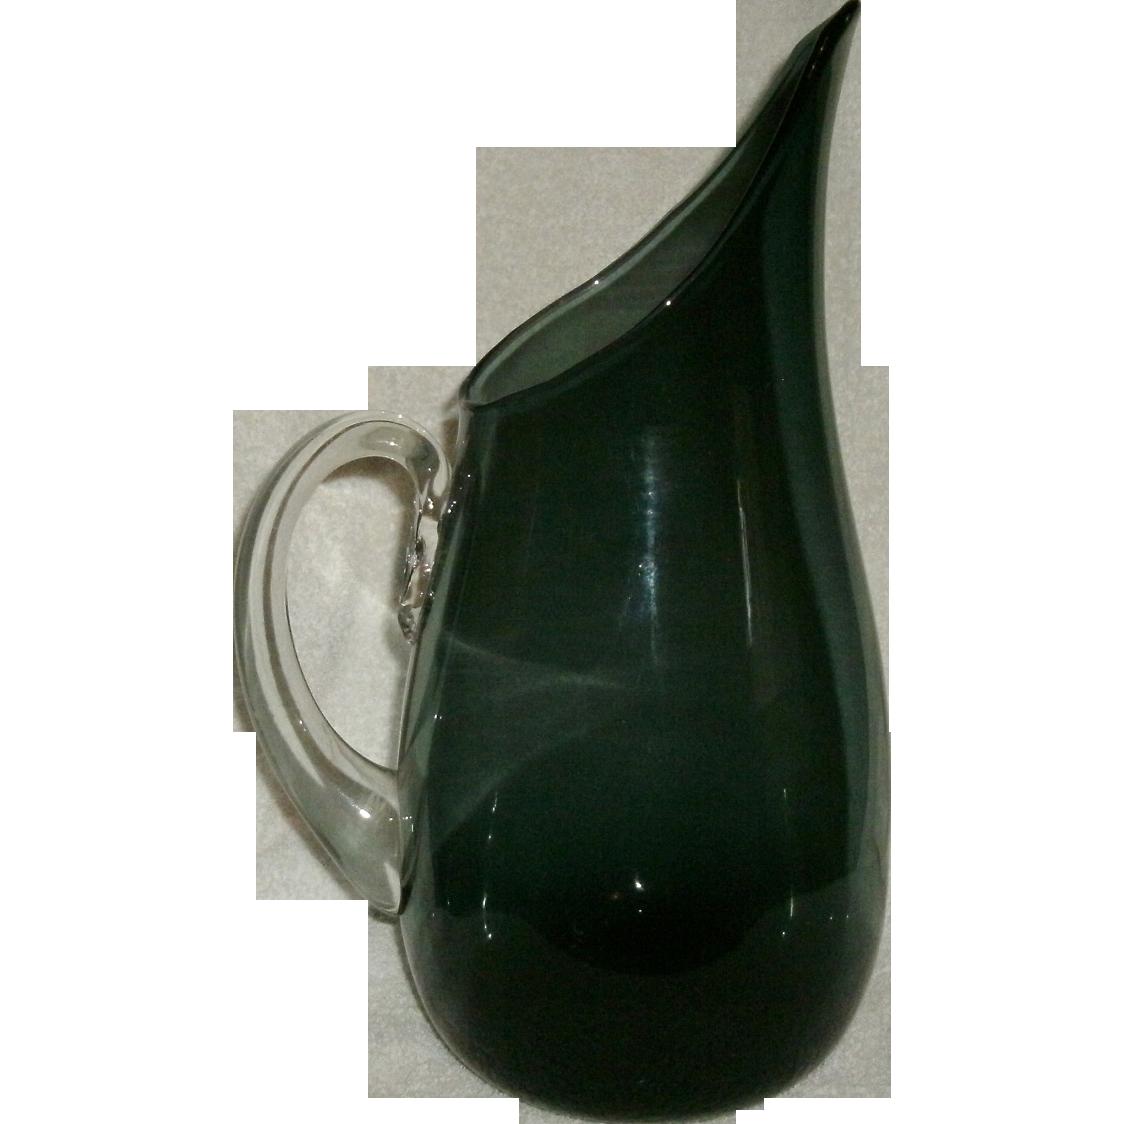 Vintage Mid Century Modern Hand Blown Charcoal Gray Blenko Art Glass Pitcher w/ Applied Handle